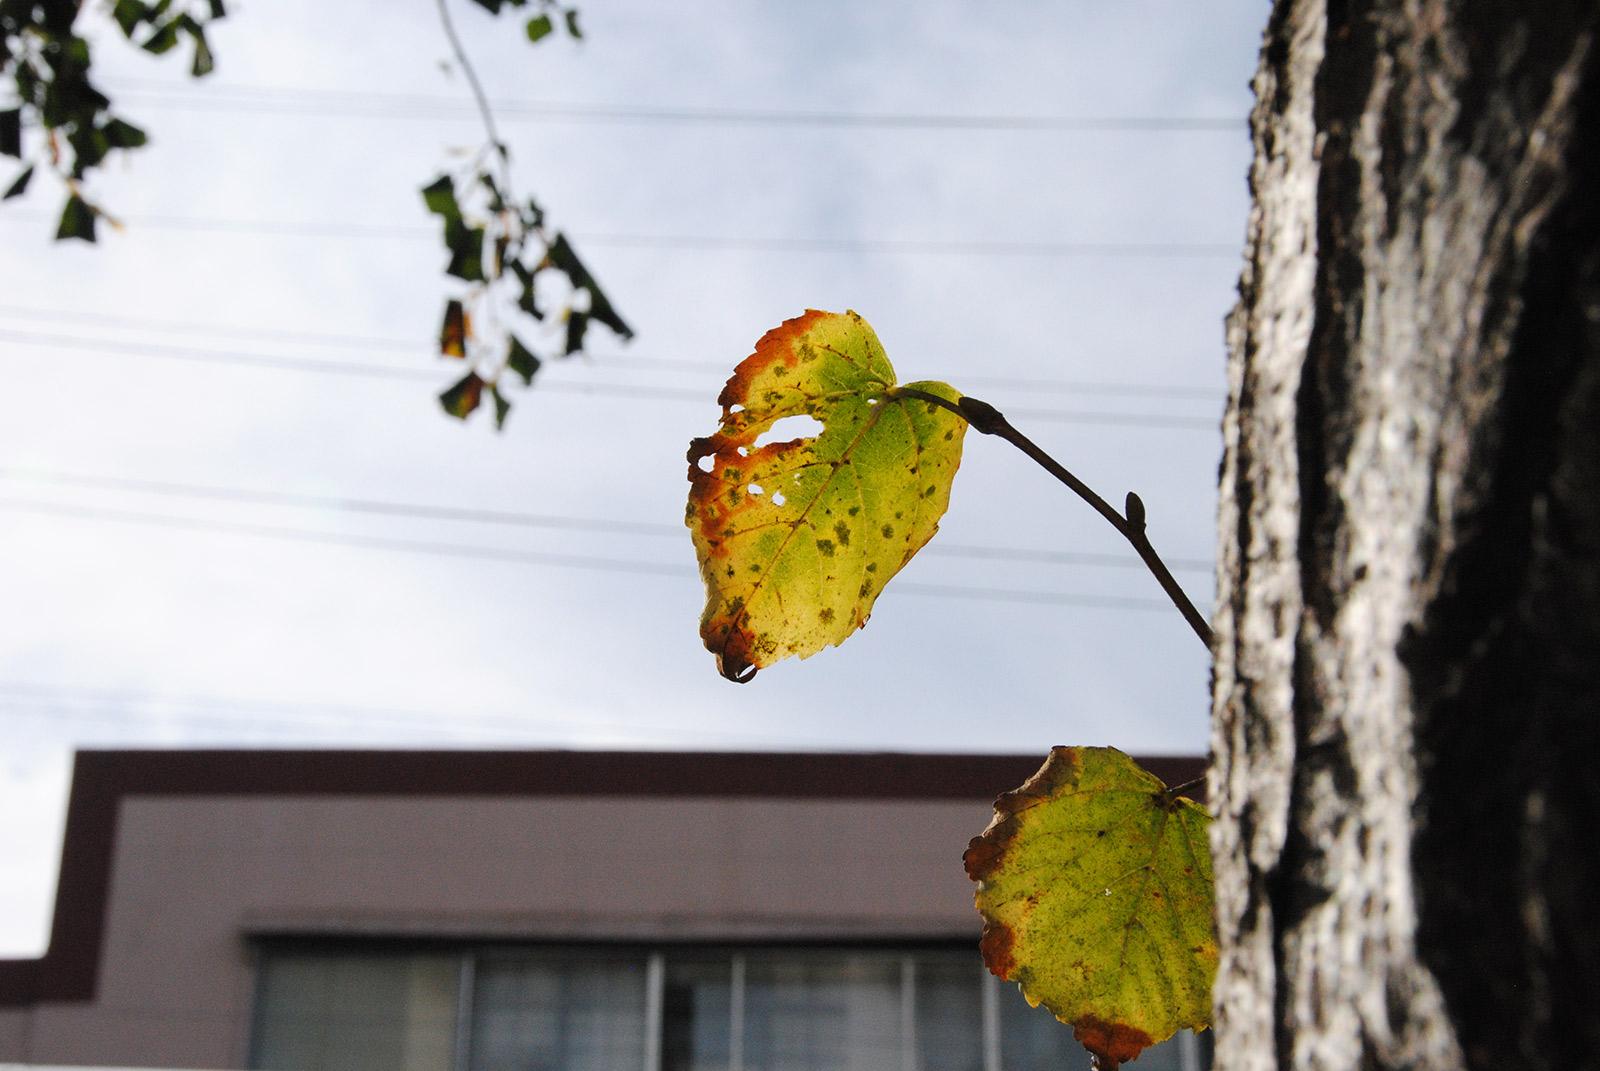 Image shows an autumn leaf